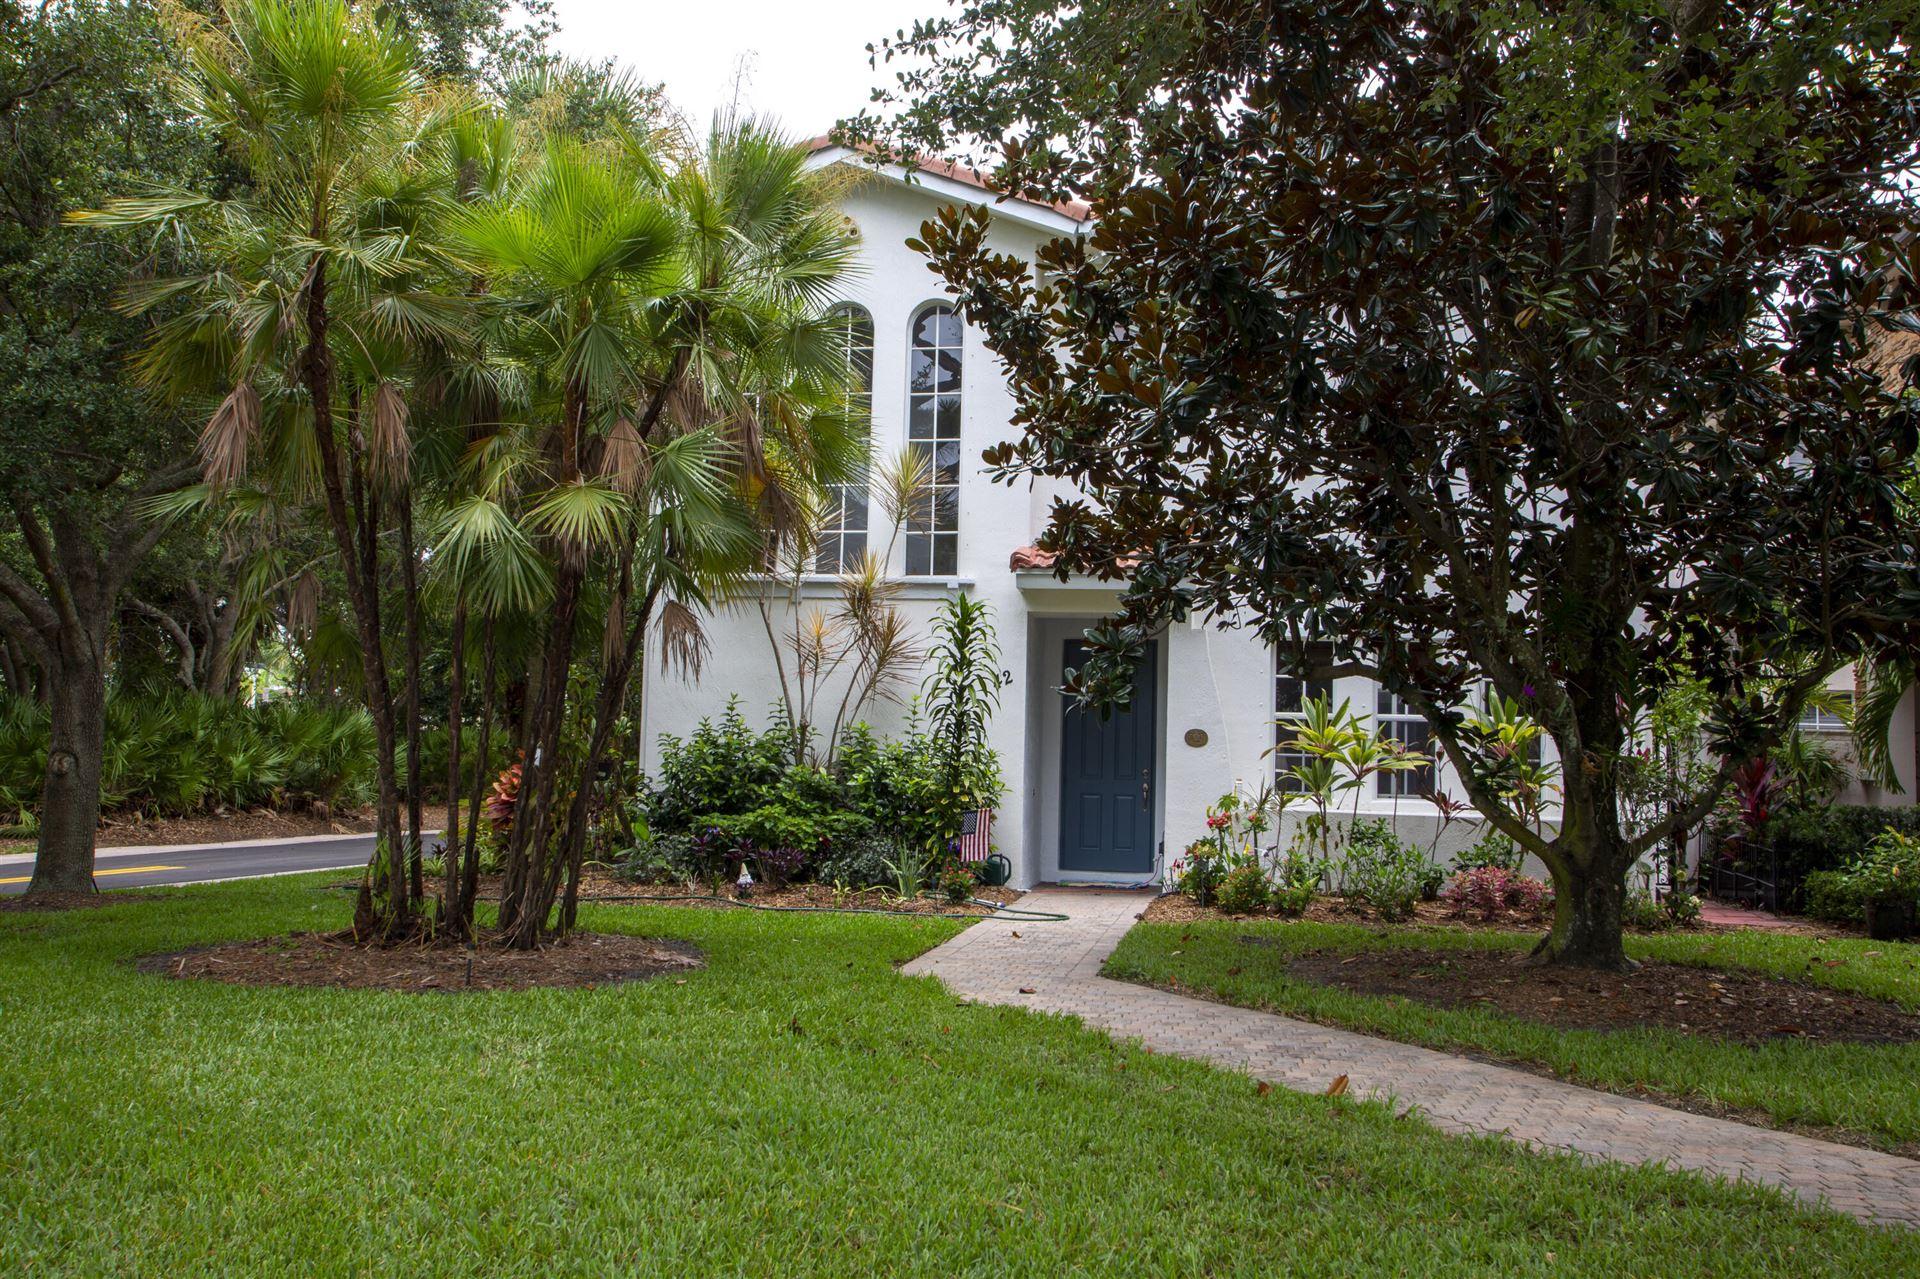 Photo of 42 Stoney Drive, Palm Beach Gardens, FL 33410 (MLS # RX-10726171)